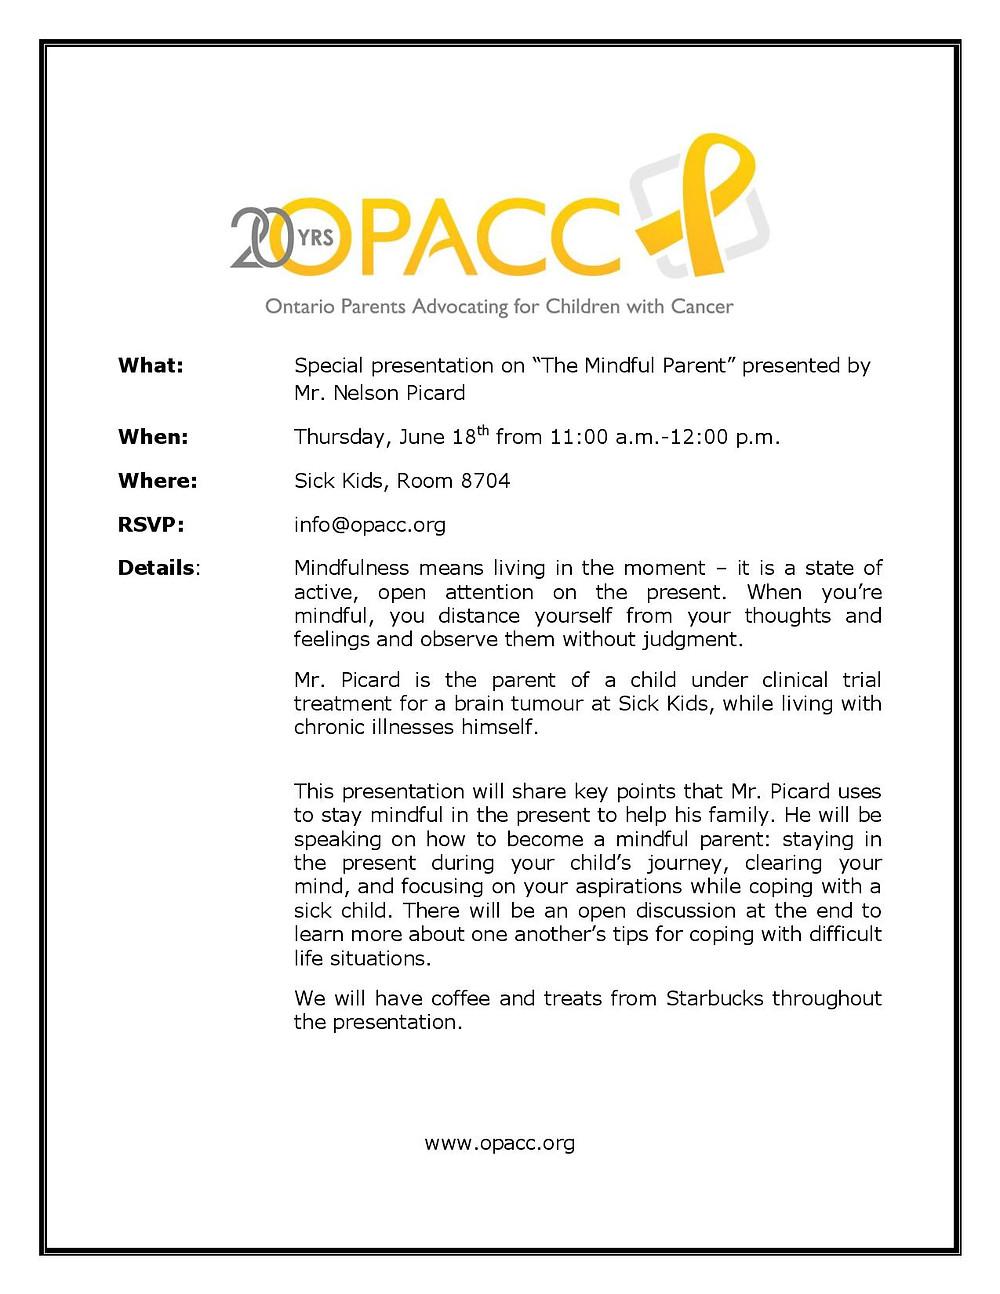 Picard-presentation-flyer-page-001.jpg